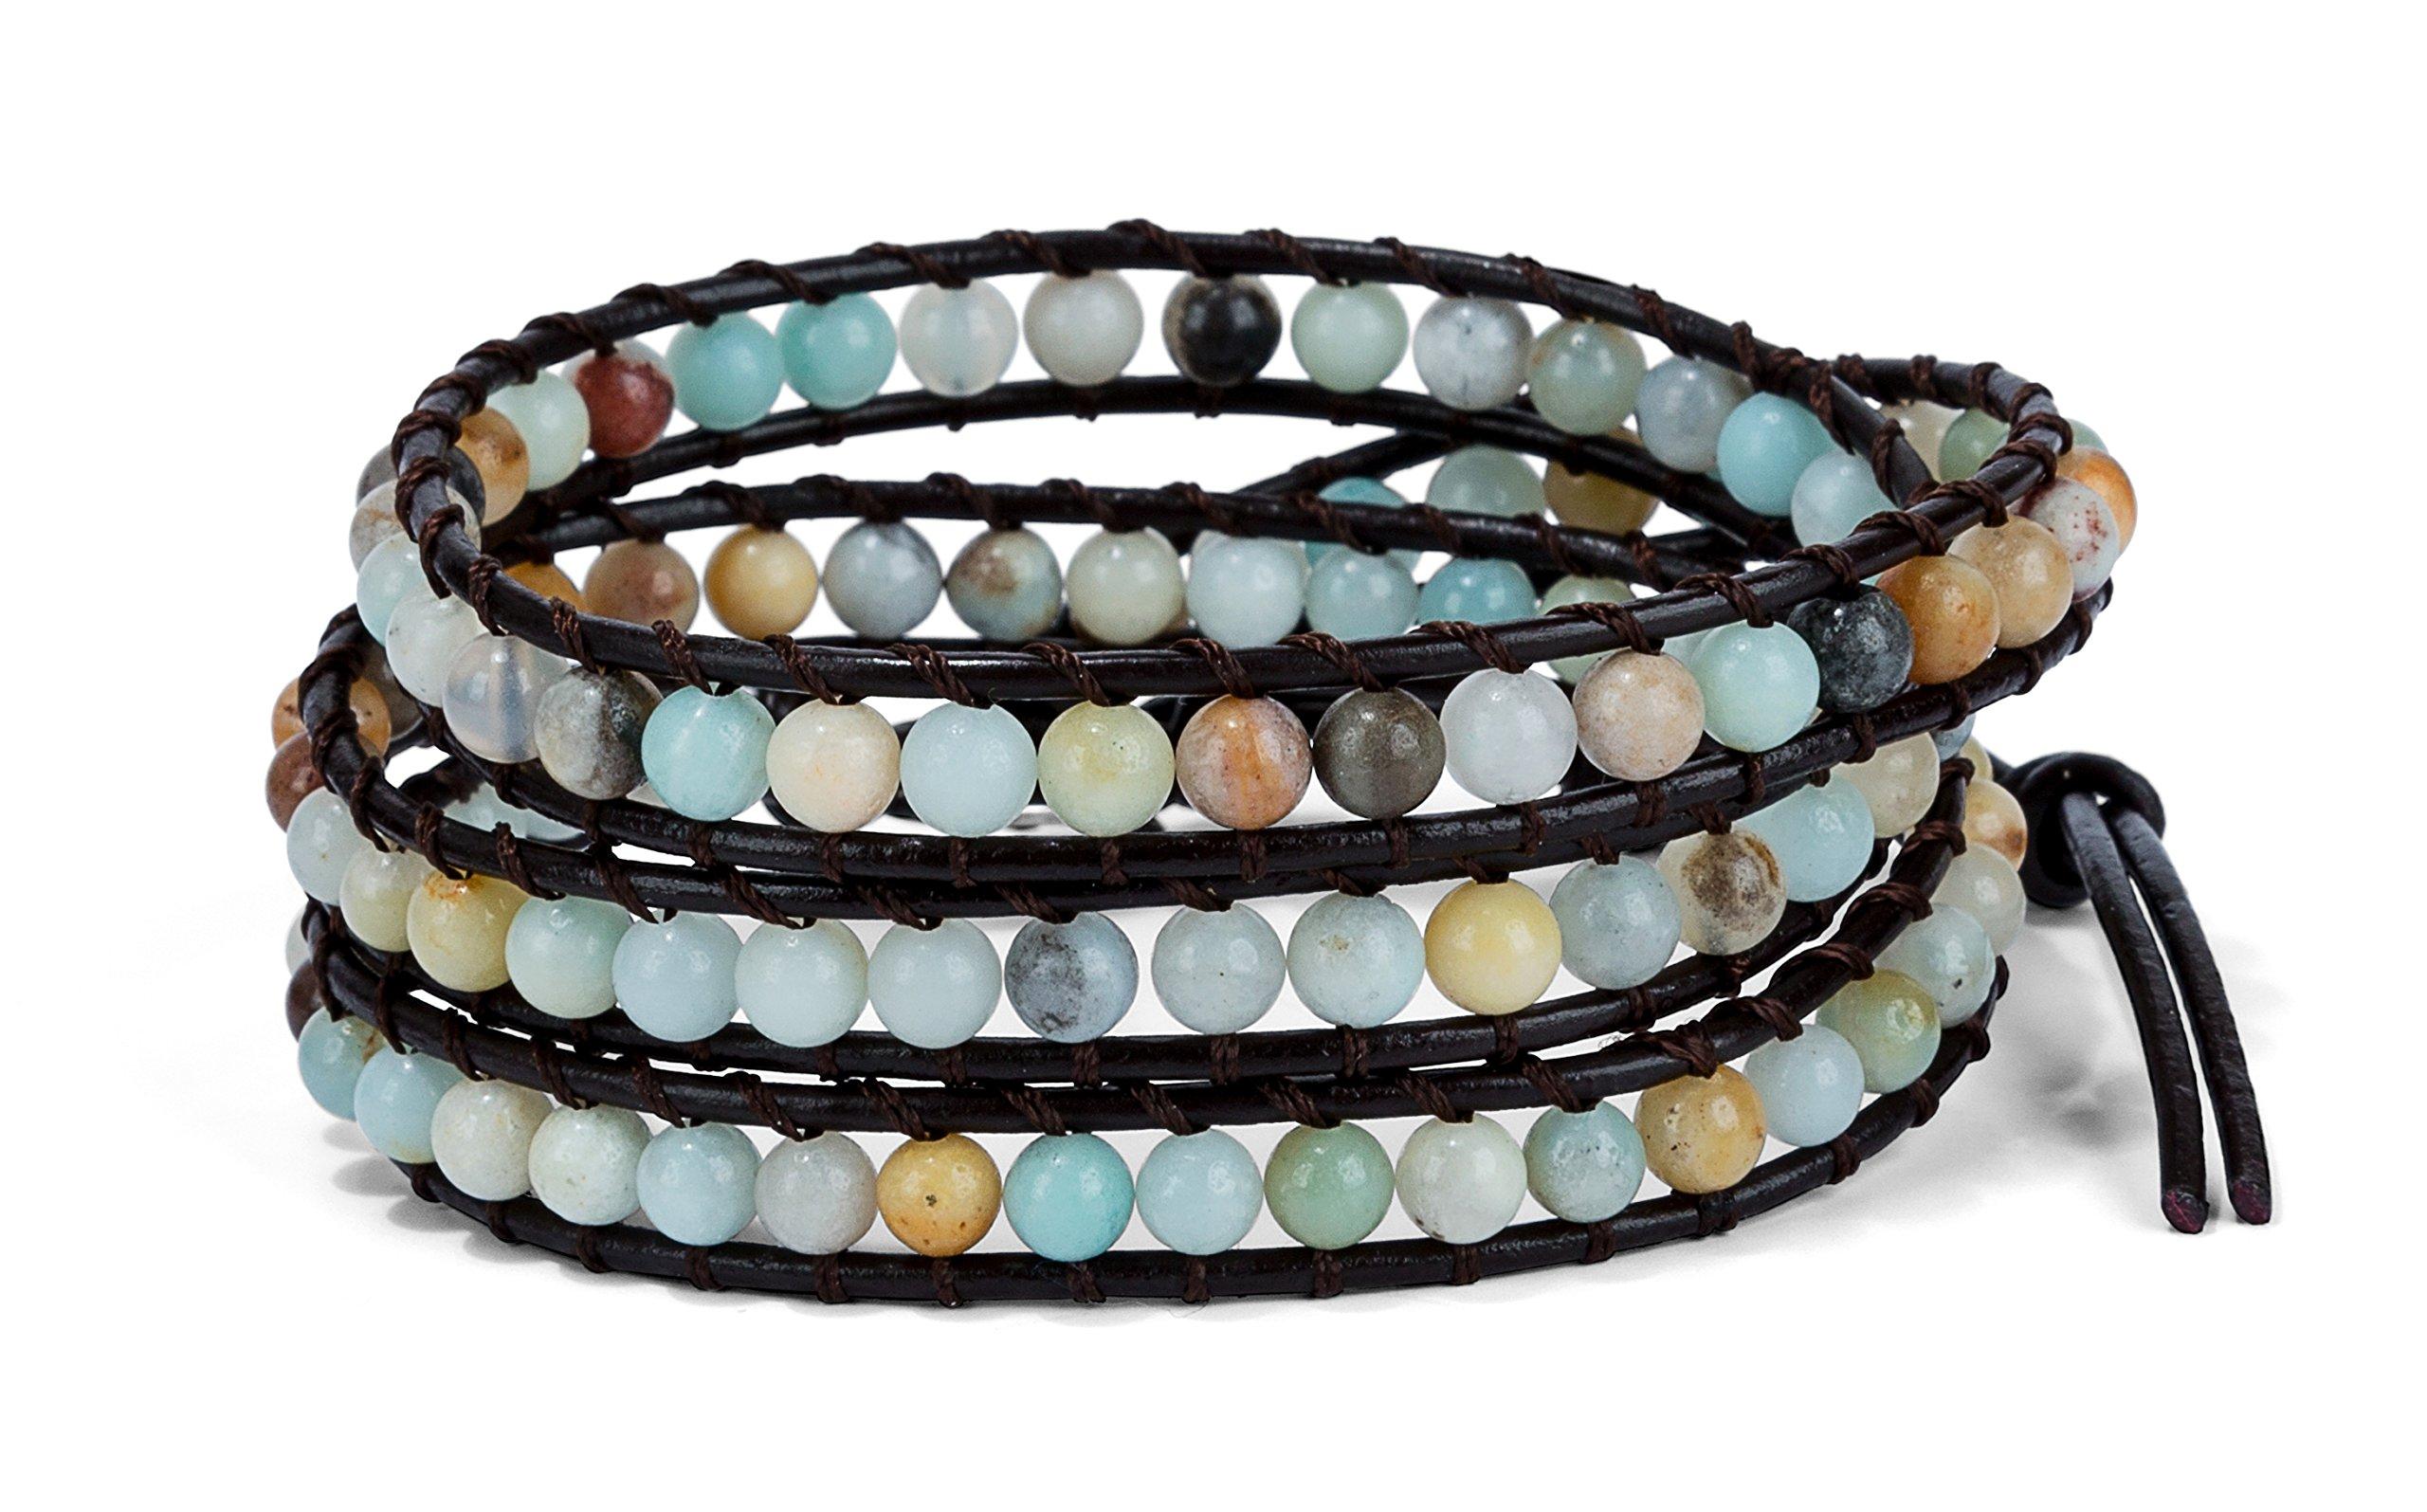 SPUNKYsoul 3 Wrap Boho Bracelet 6mm Beads Natural Stone Amazonite for Women Collection by SPUNKYsoul